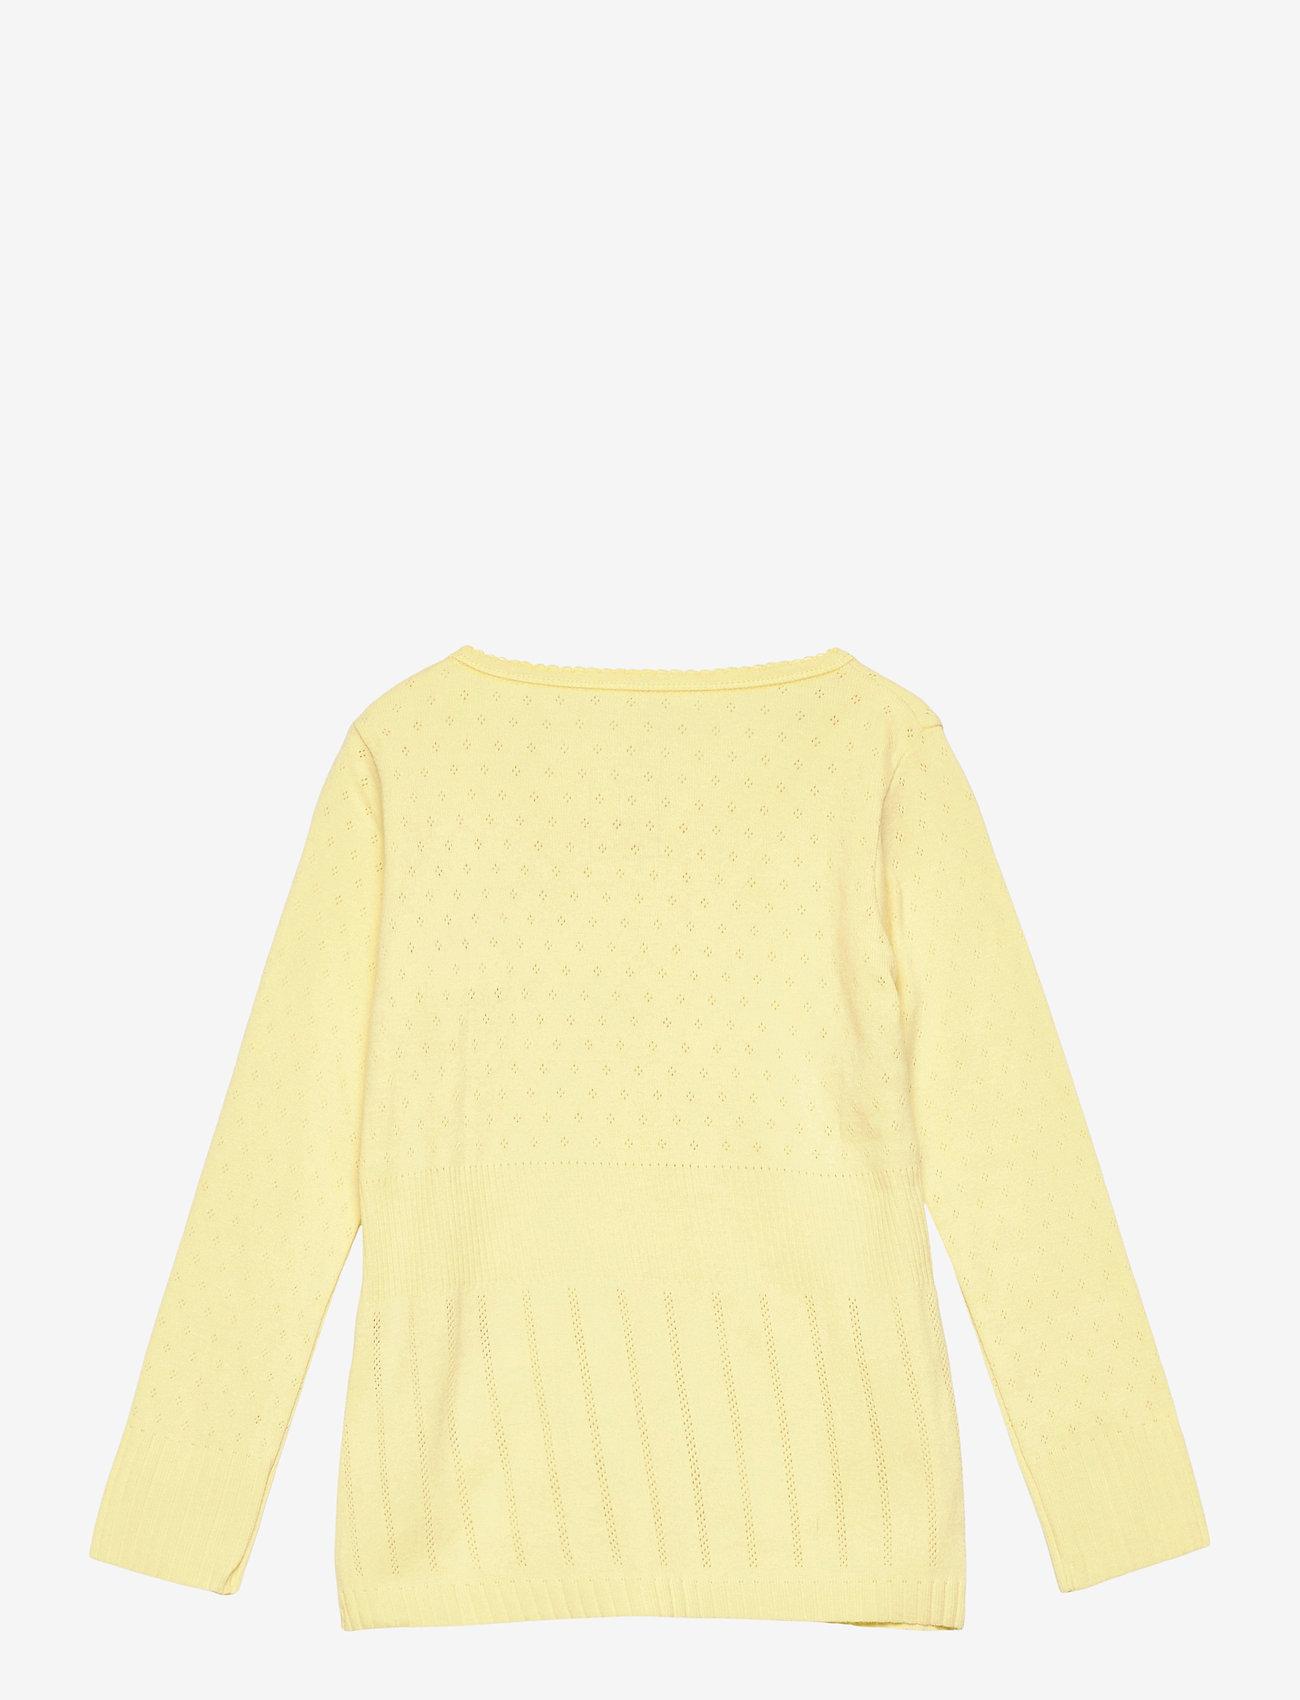 Noa Noa Miniature - Cardigan - gilets - lemon grass - 1